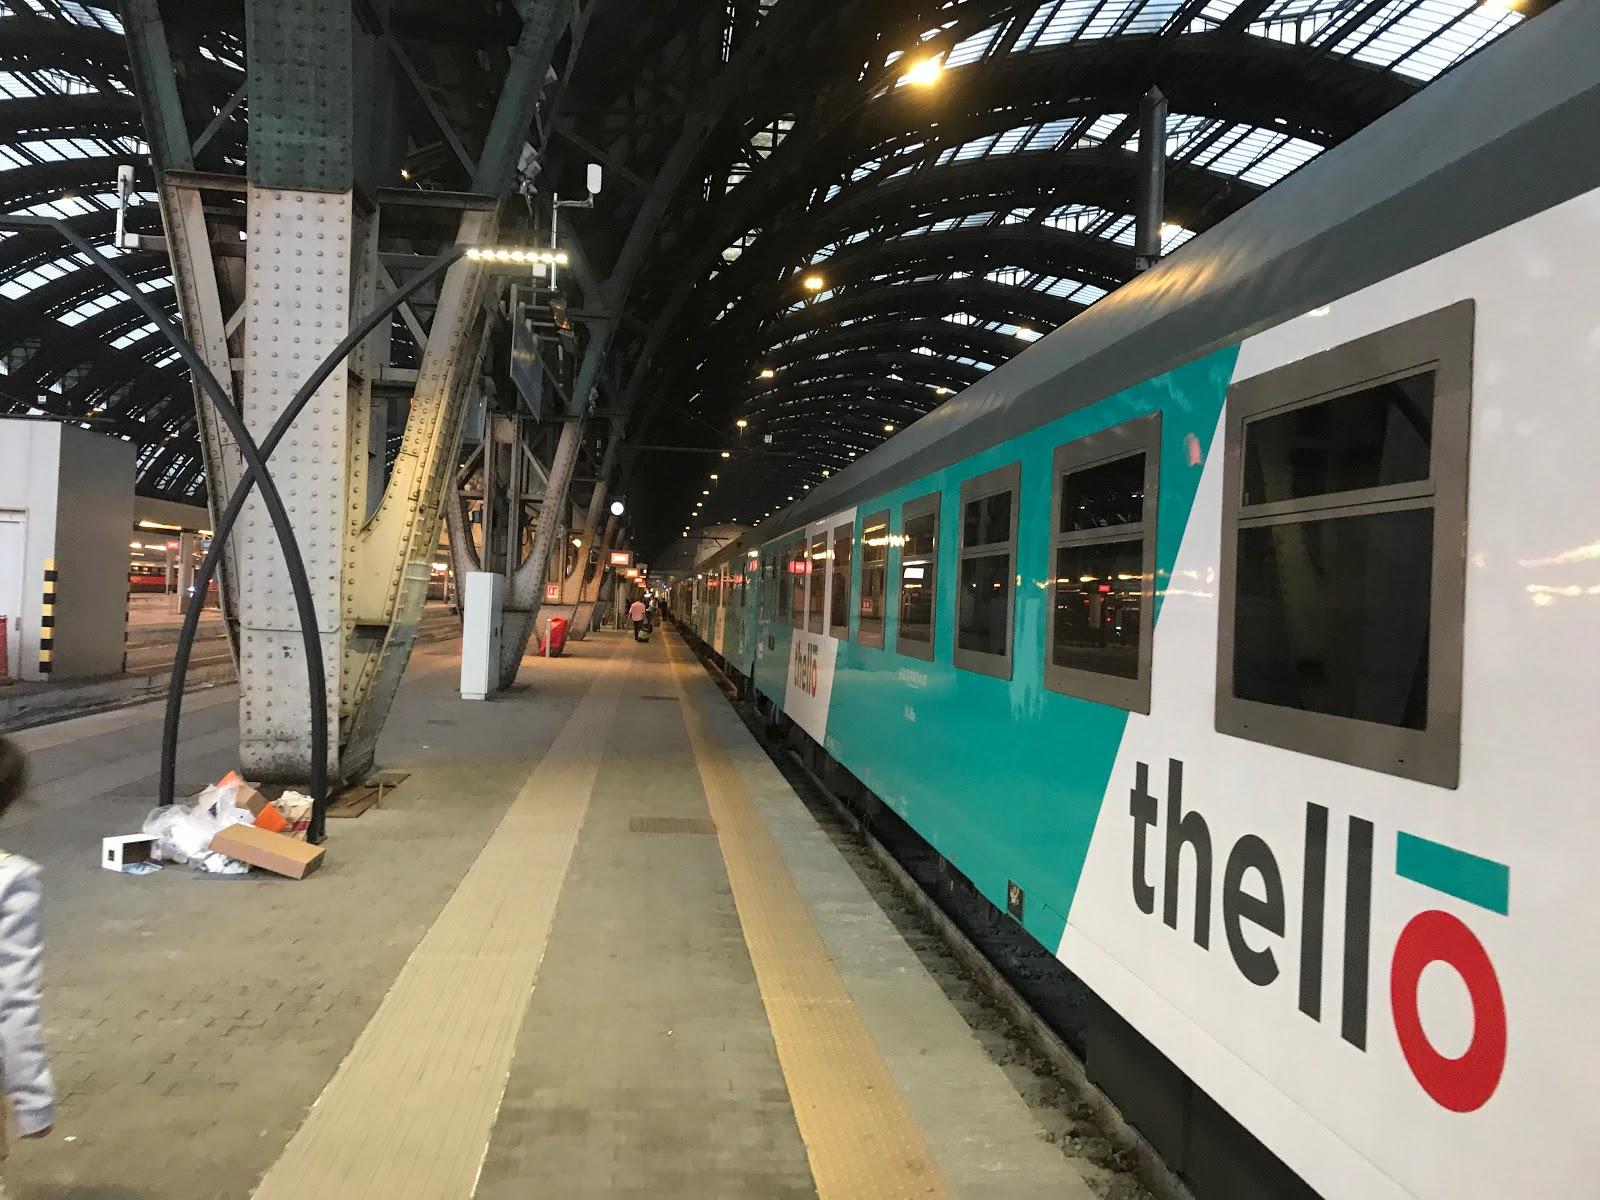 train-to-milan-italy